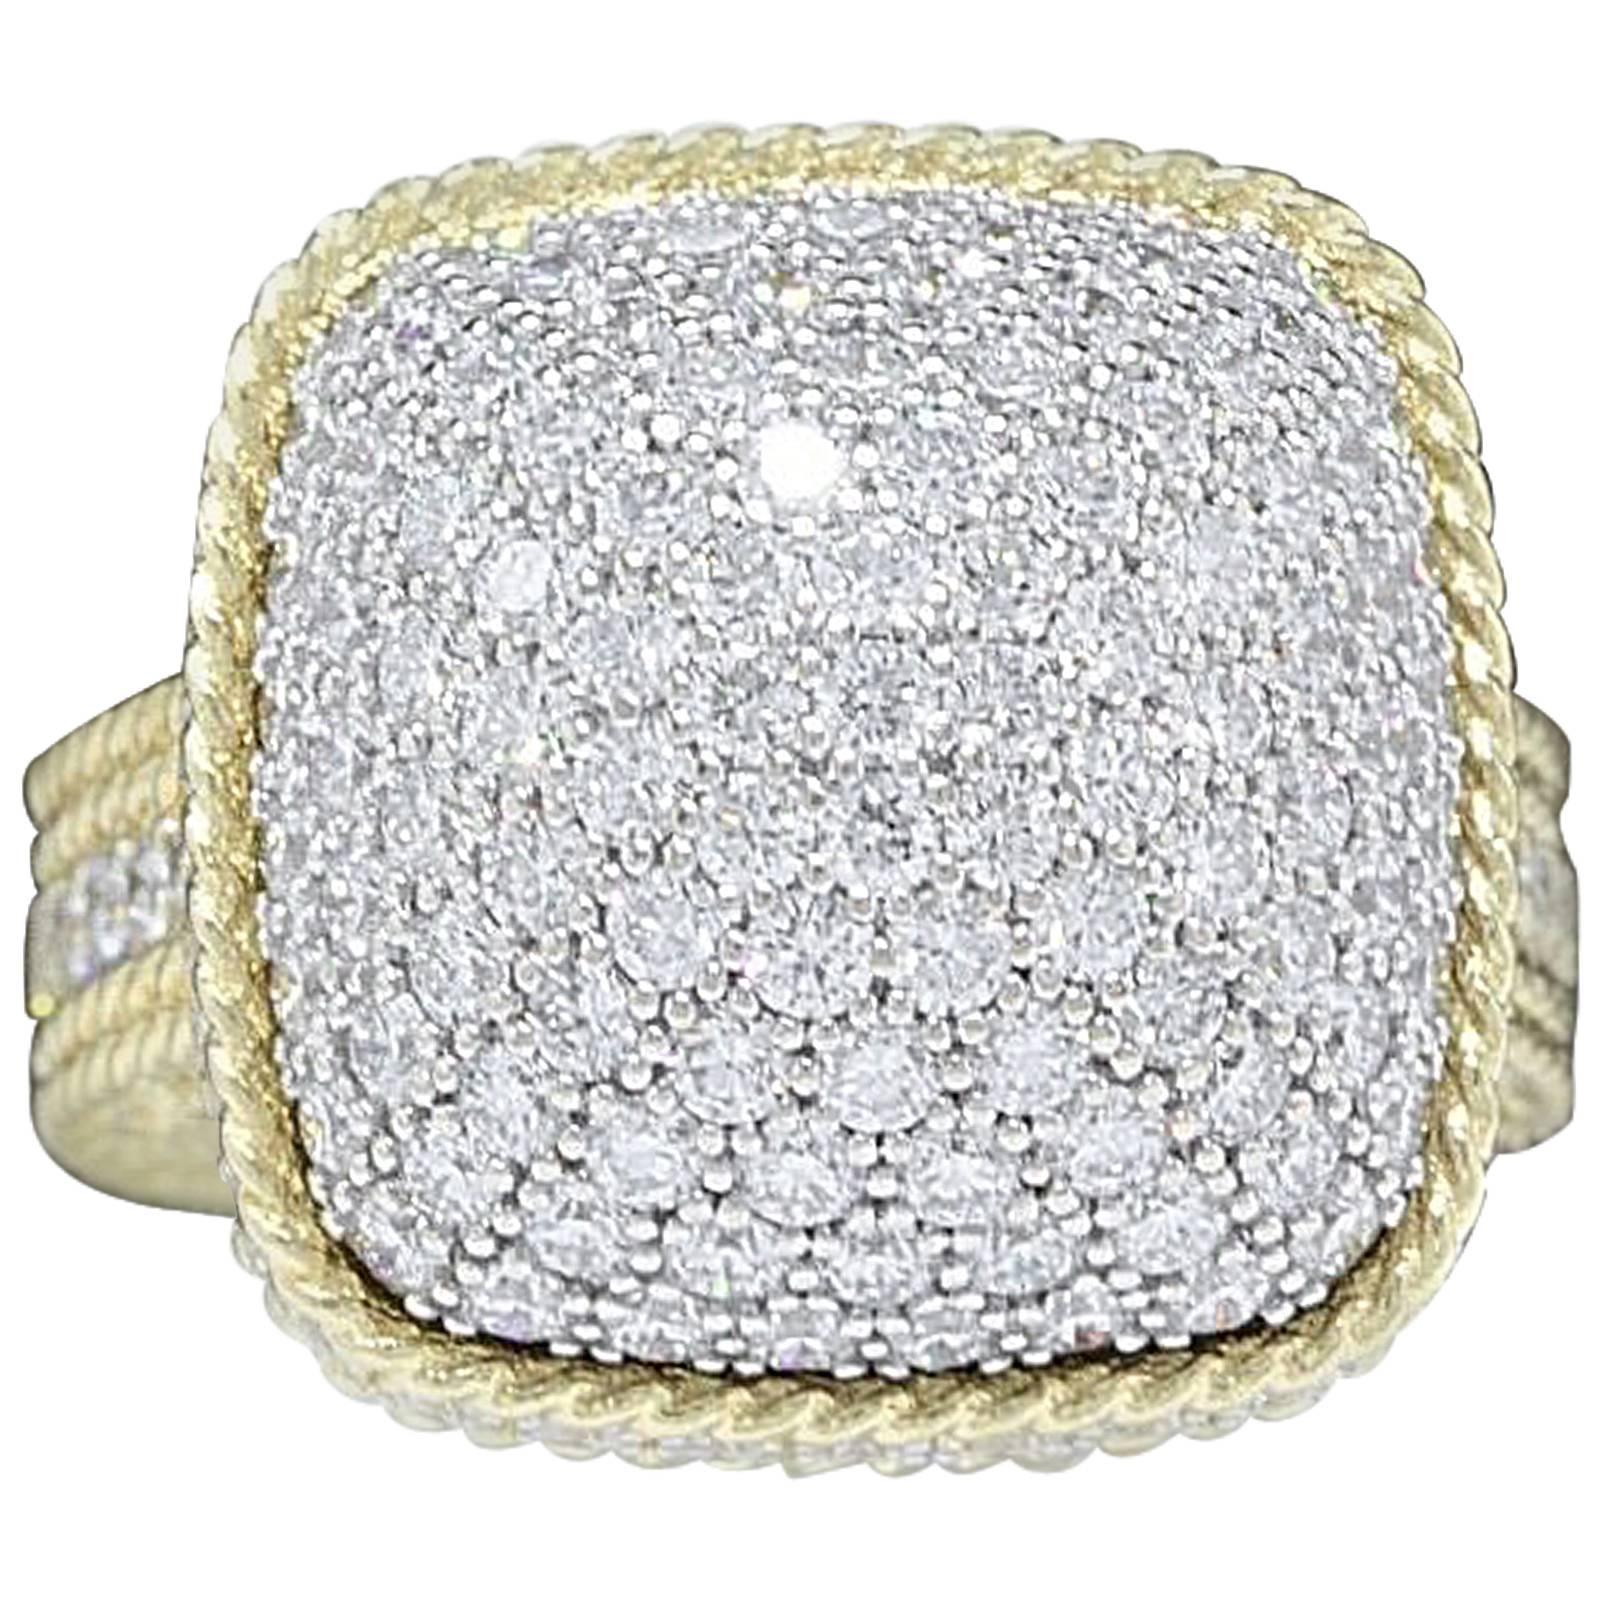 Roberto Coin Barocco 3.30 Carat Diamond Dome Ring 18 Karat Yellow Gold